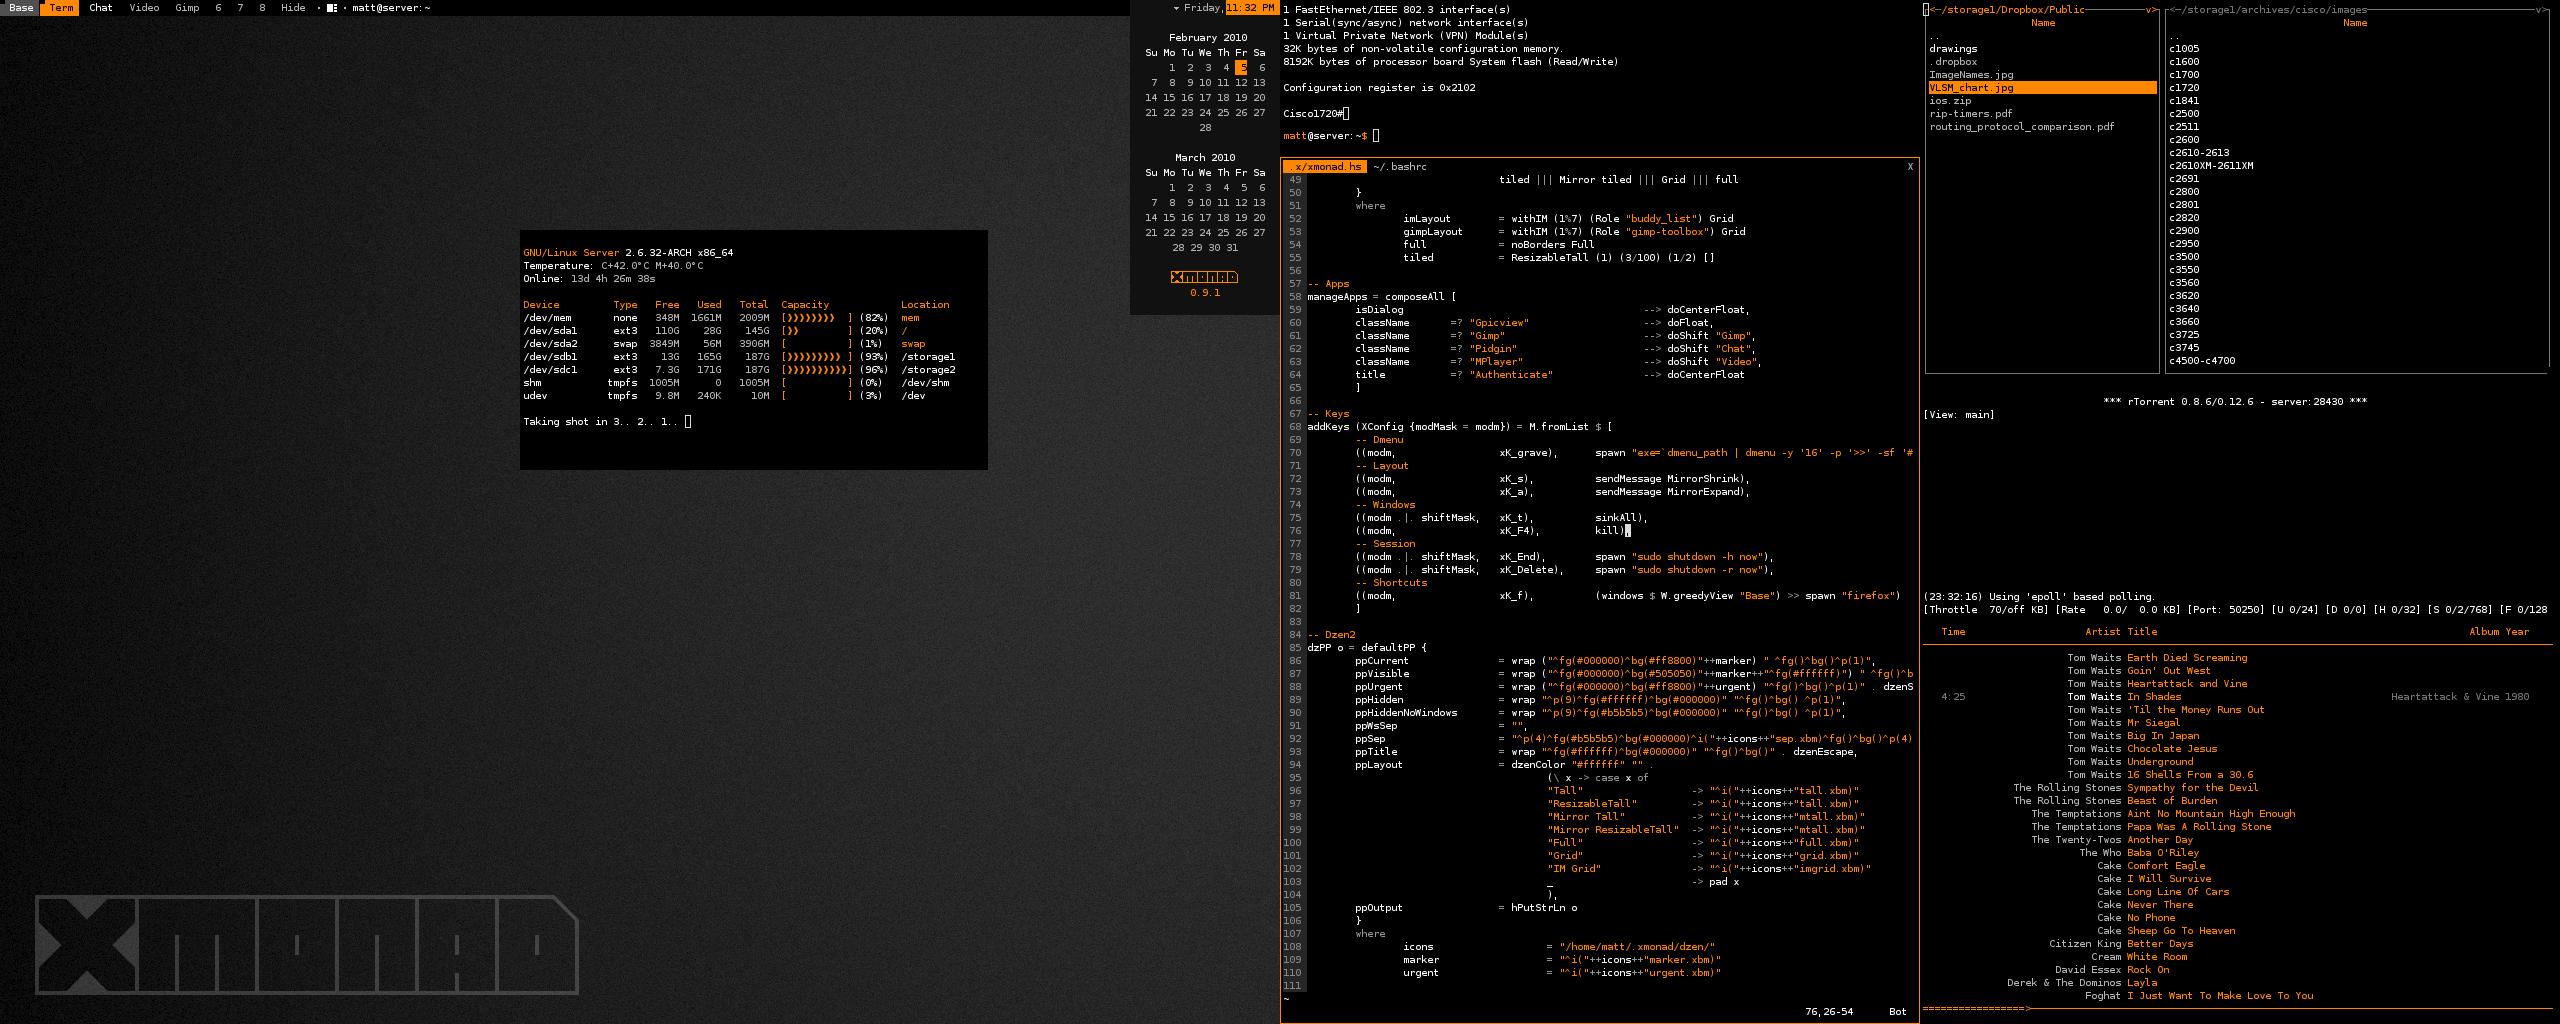 Xmonad 0.9.1 by graveyardpc